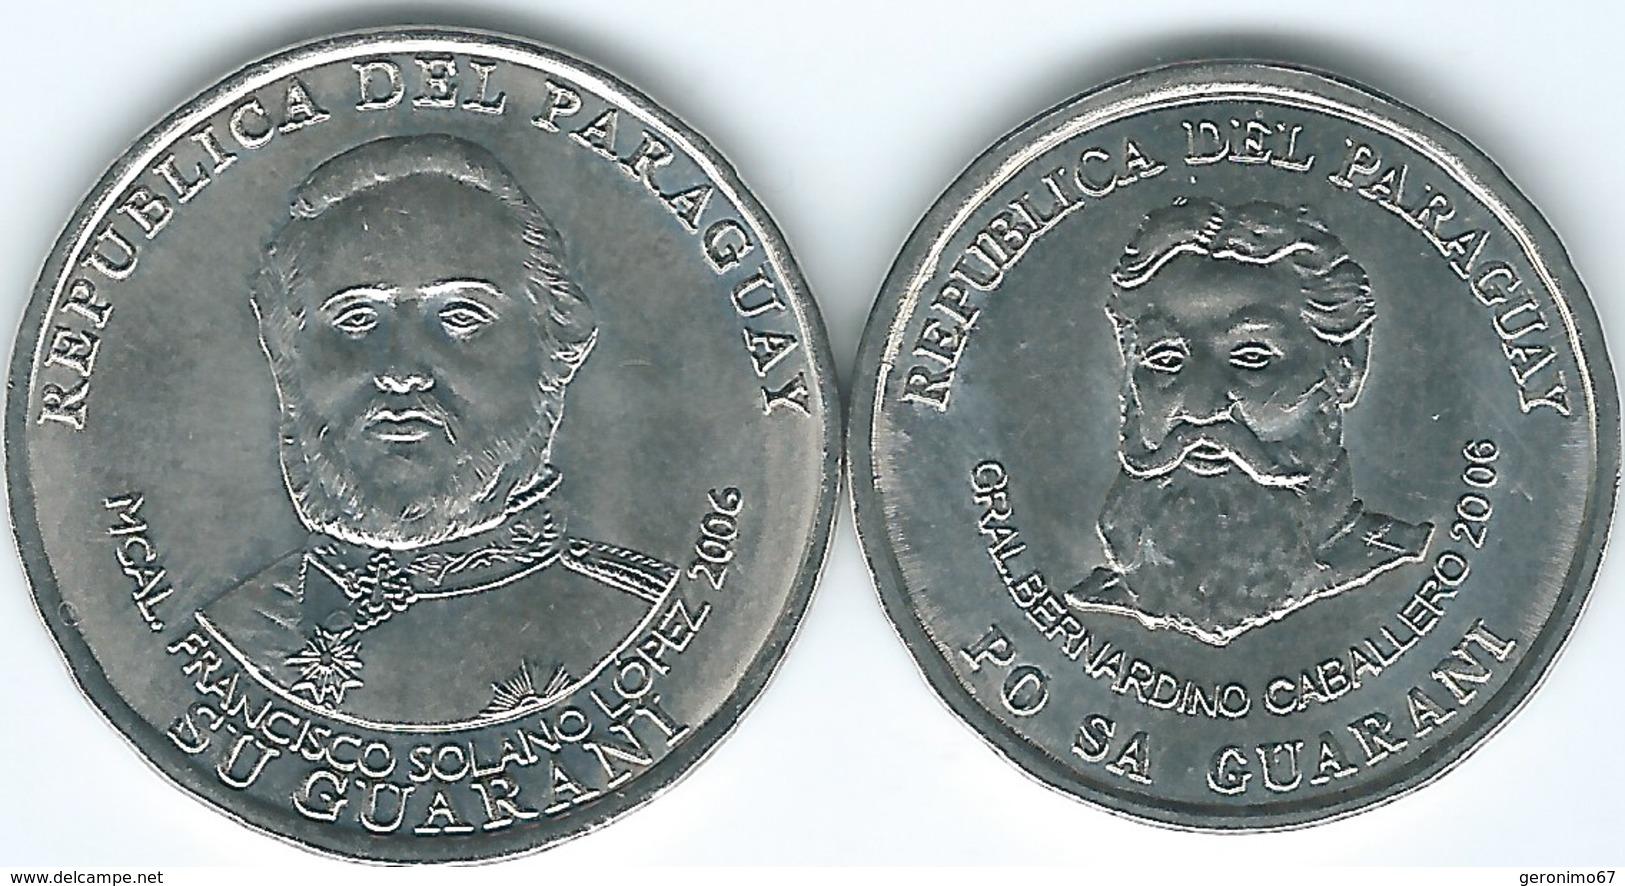 Paraguay - 2006 - 500 Guaraníes - KM195a & 1000 Guaraníes - KM198 - Paraguay